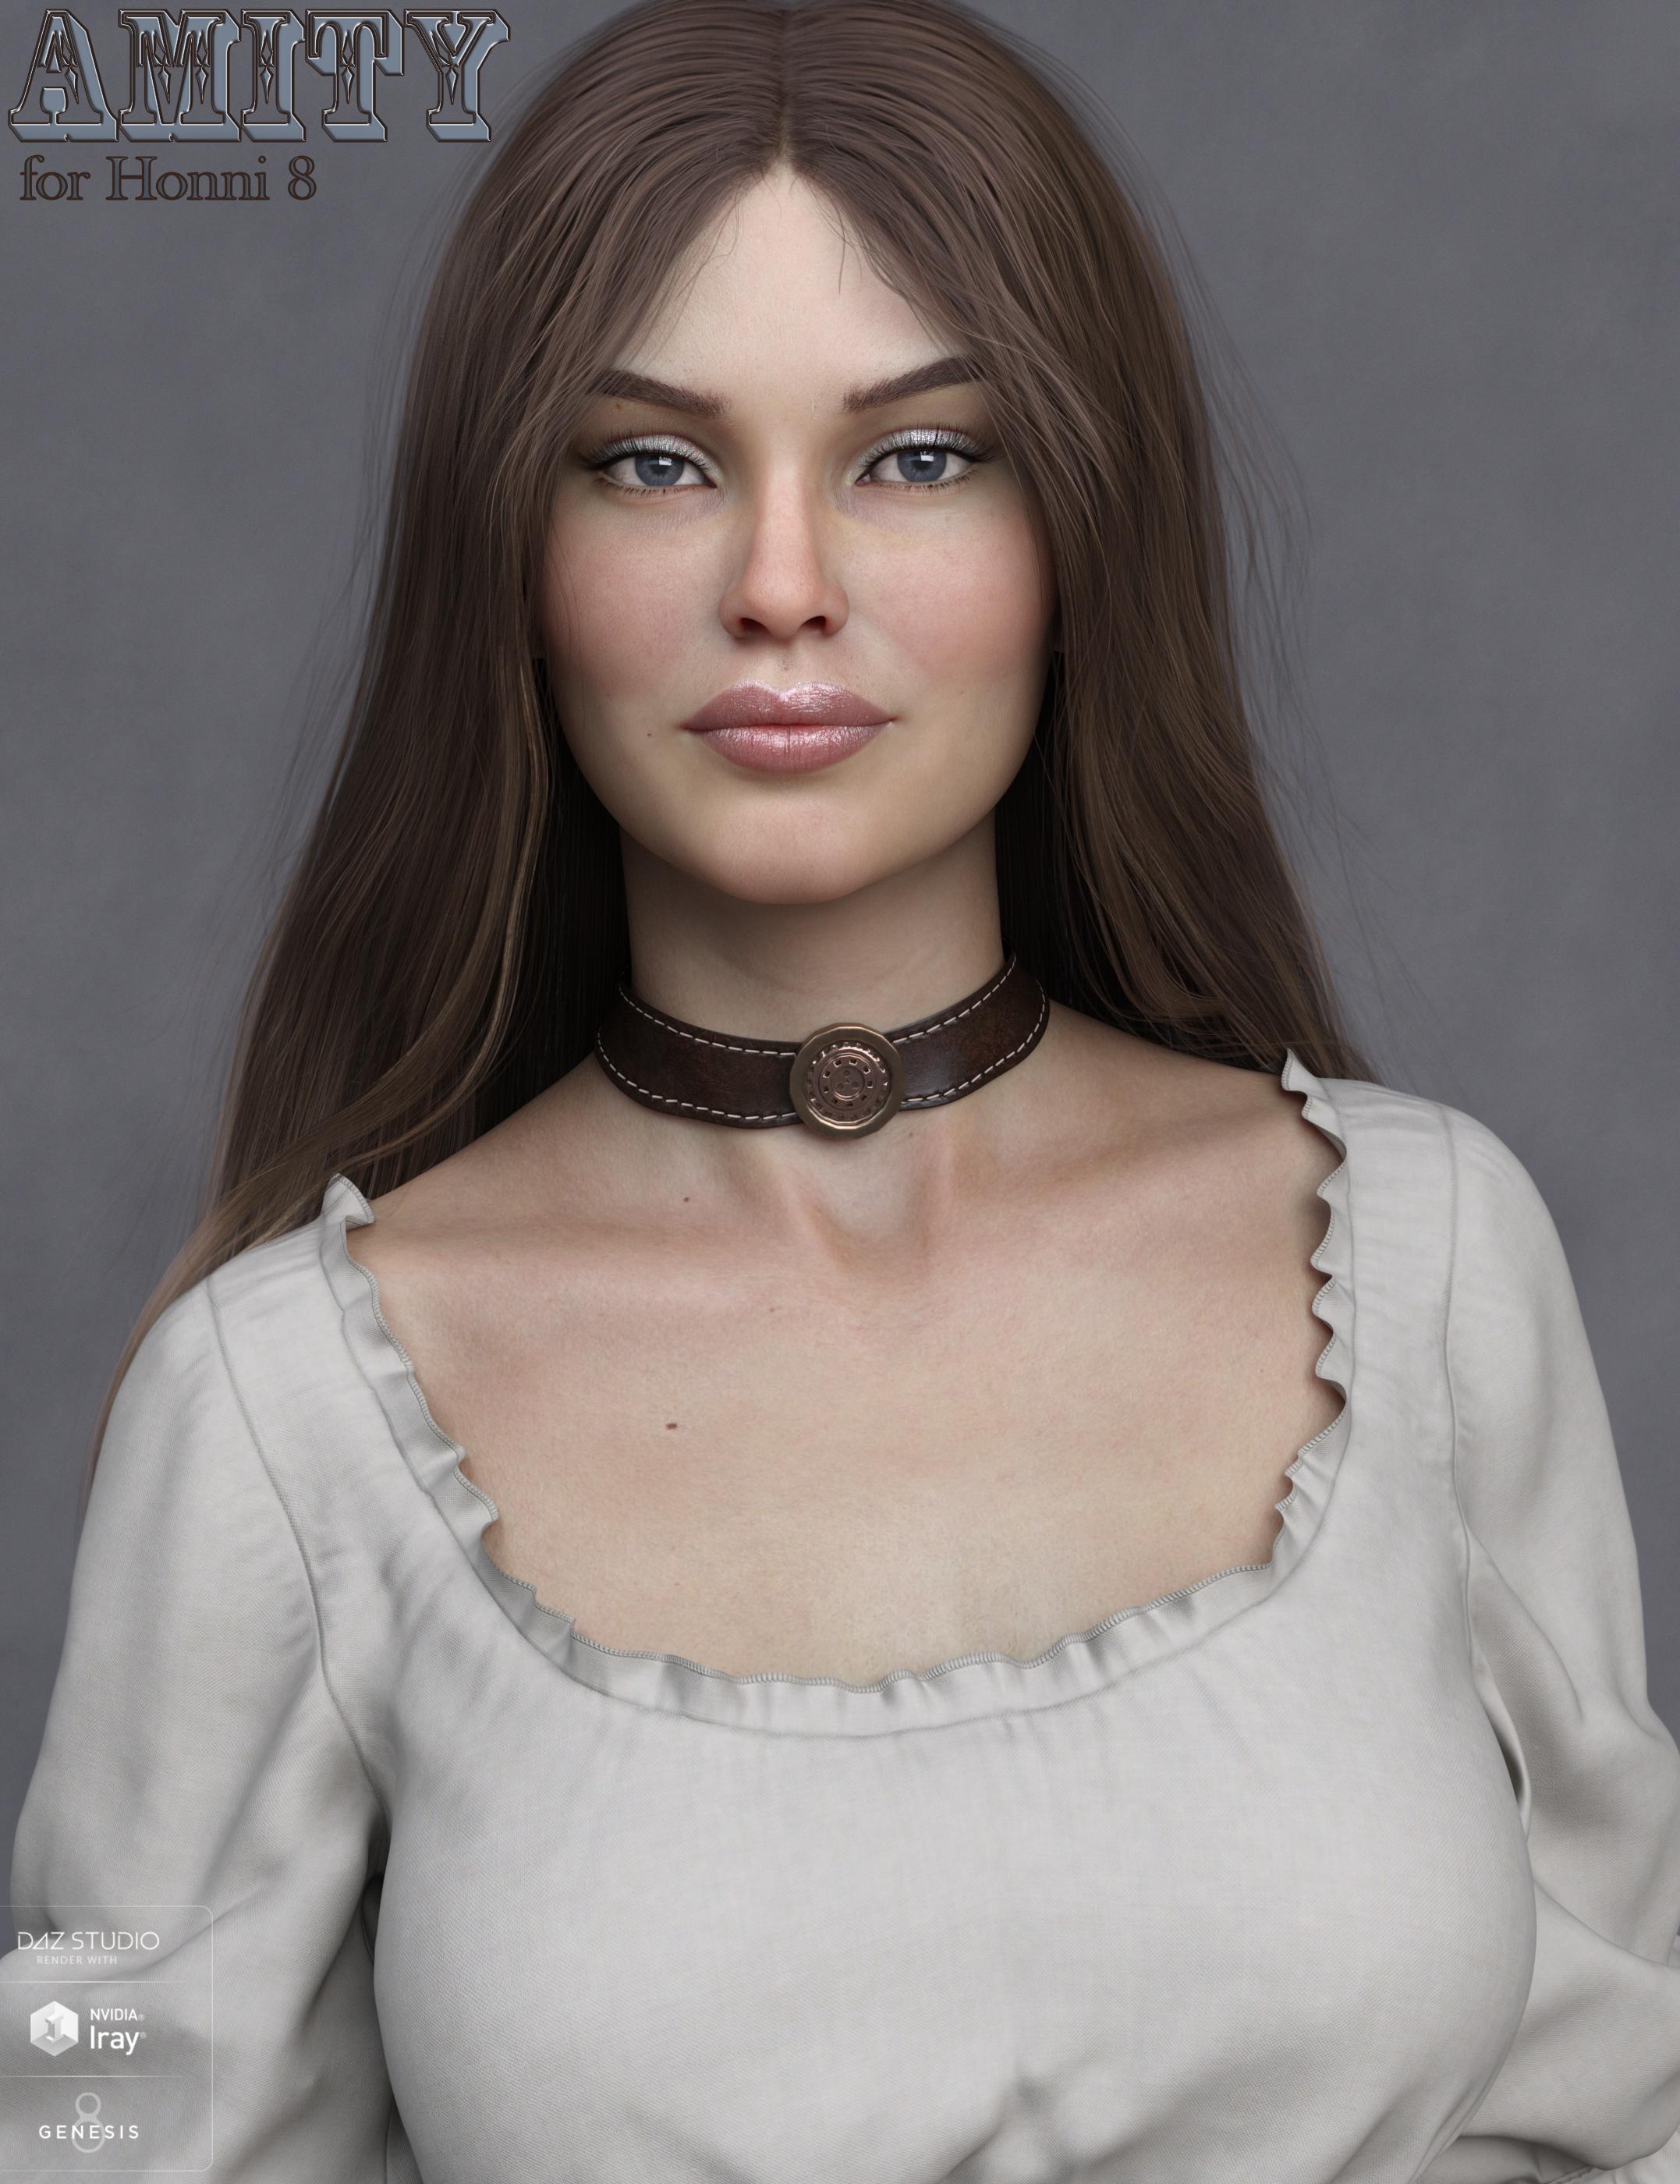 Amity HD for Honni 8 by: EmrysMorris, 3D Models by Daz 3D